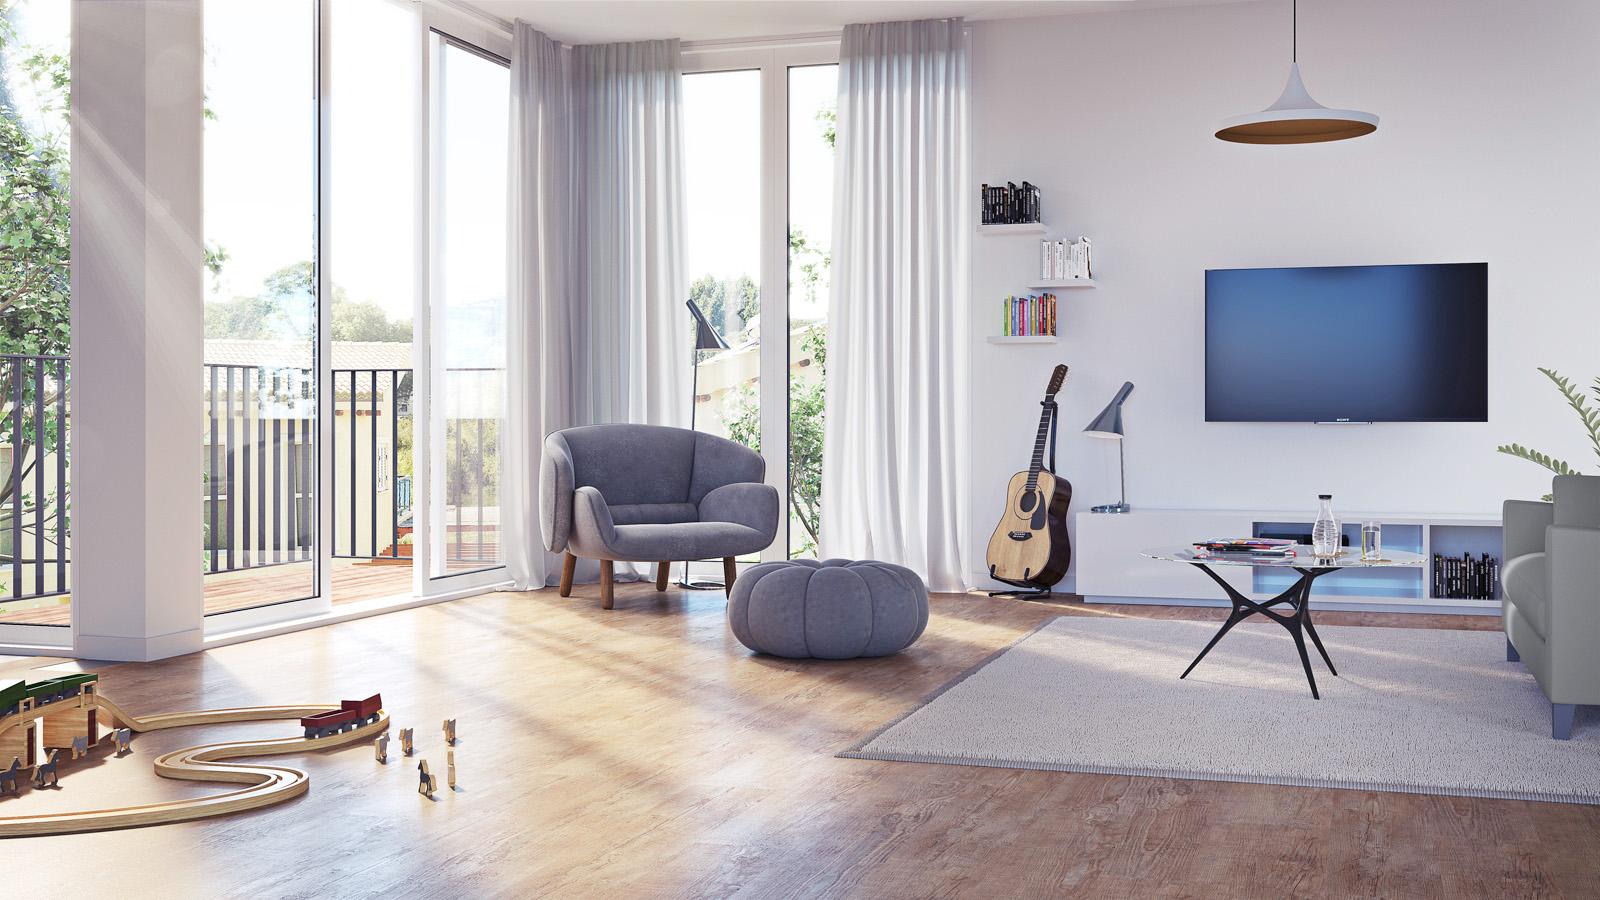 fokuspunkt raumplaner 3d visualisierung fokuspunkt. Black Bedroom Furniture Sets. Home Design Ideas